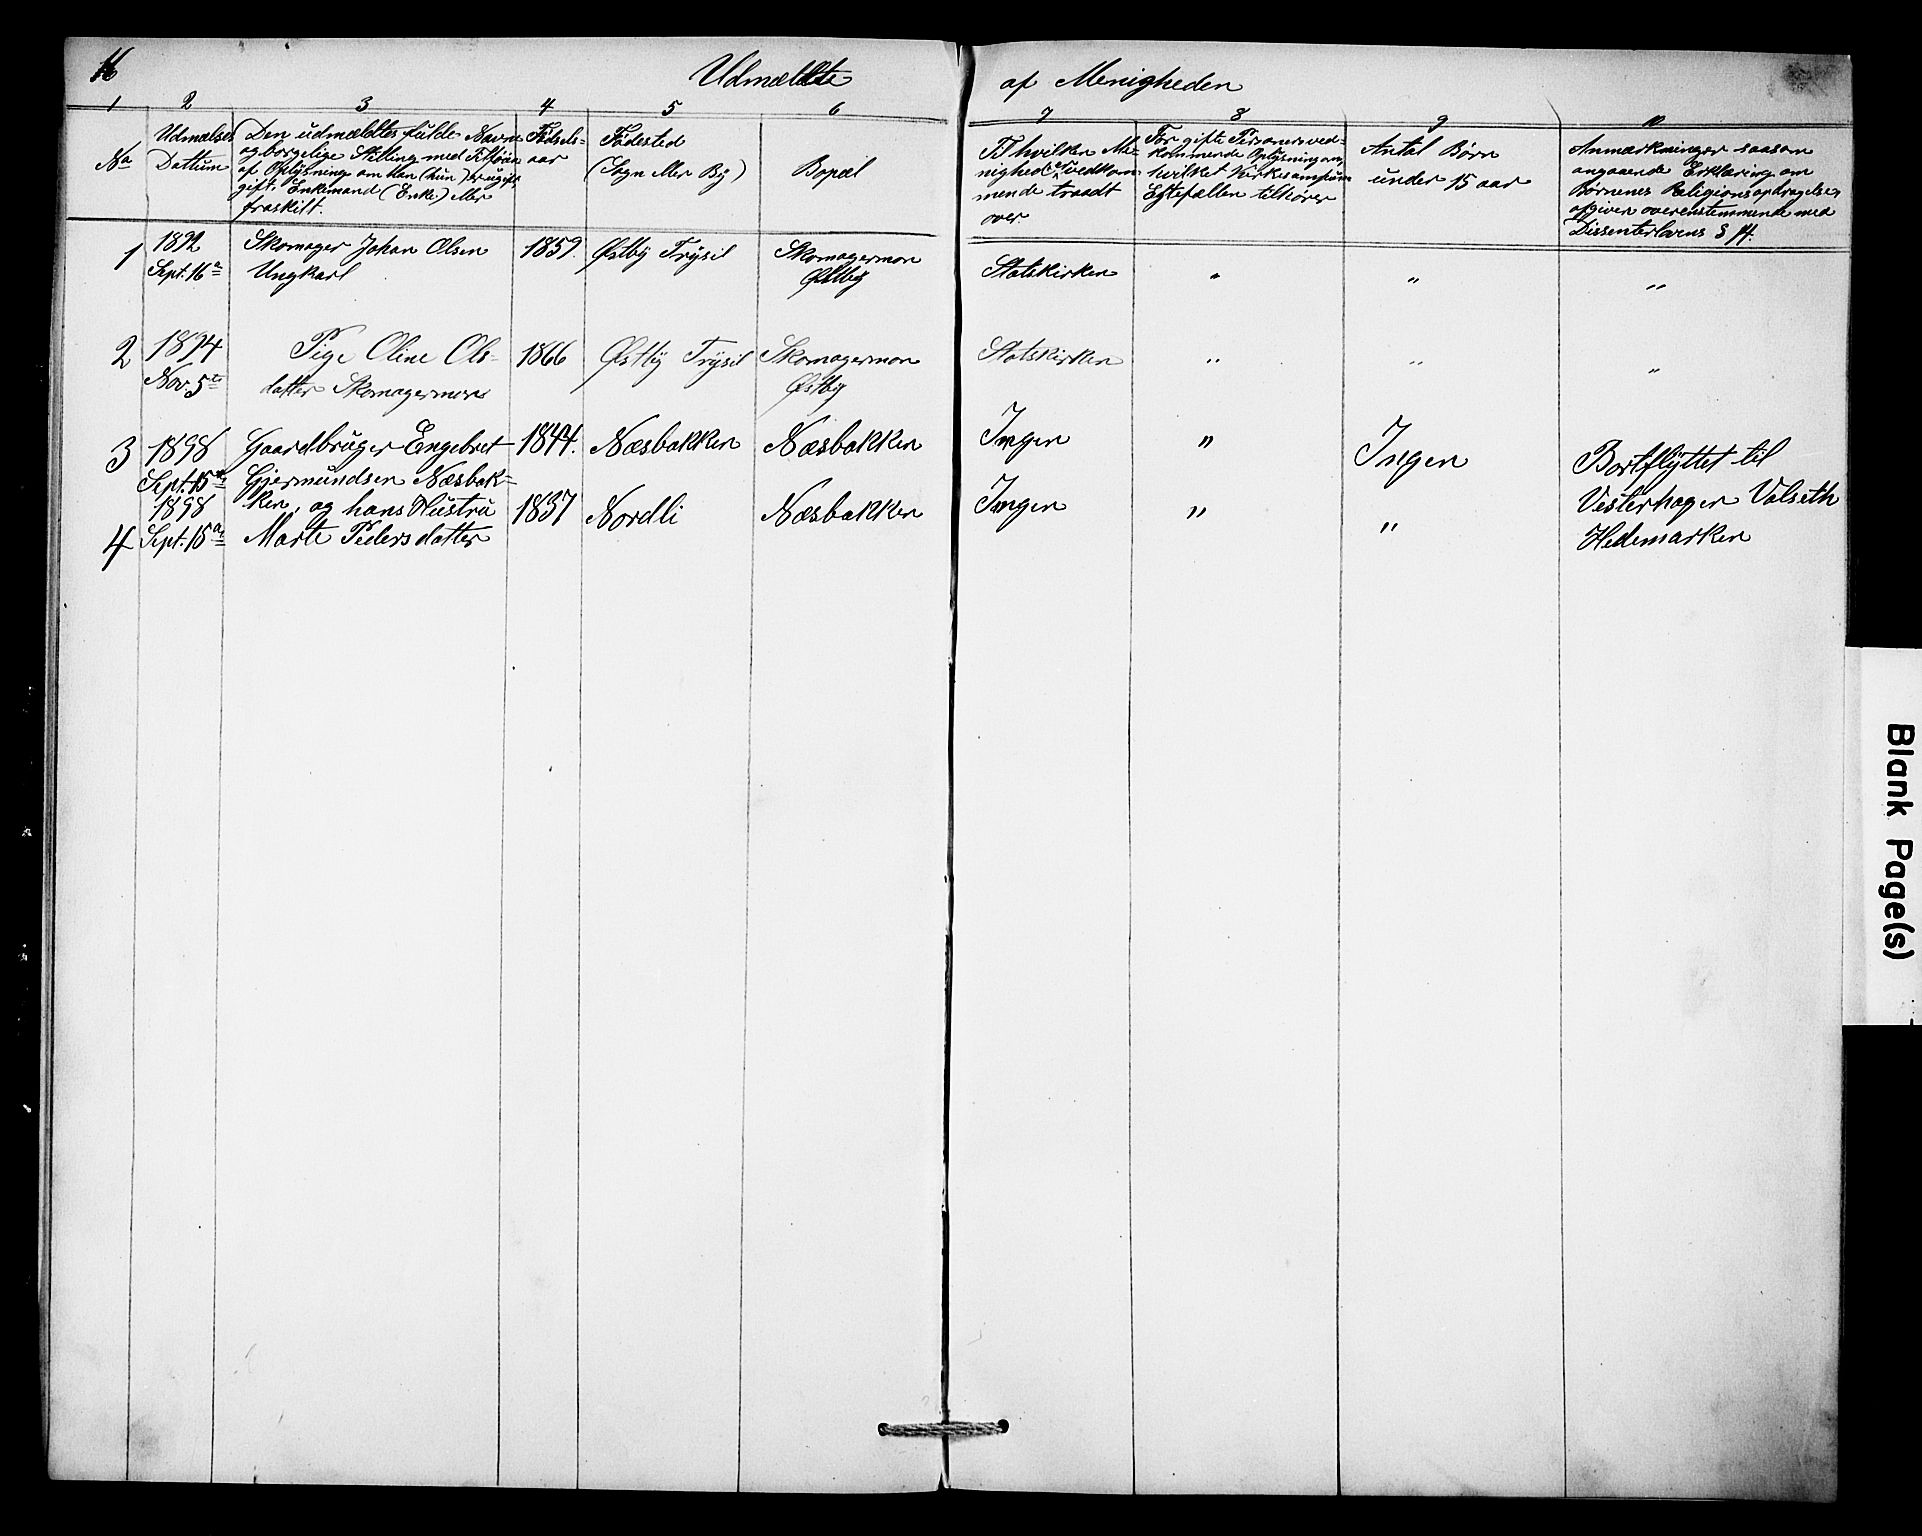 SAH, Misjonsforbundet, 01/L0003: Dissenterprotokoll nr. 3, 1892-1920, s. 16